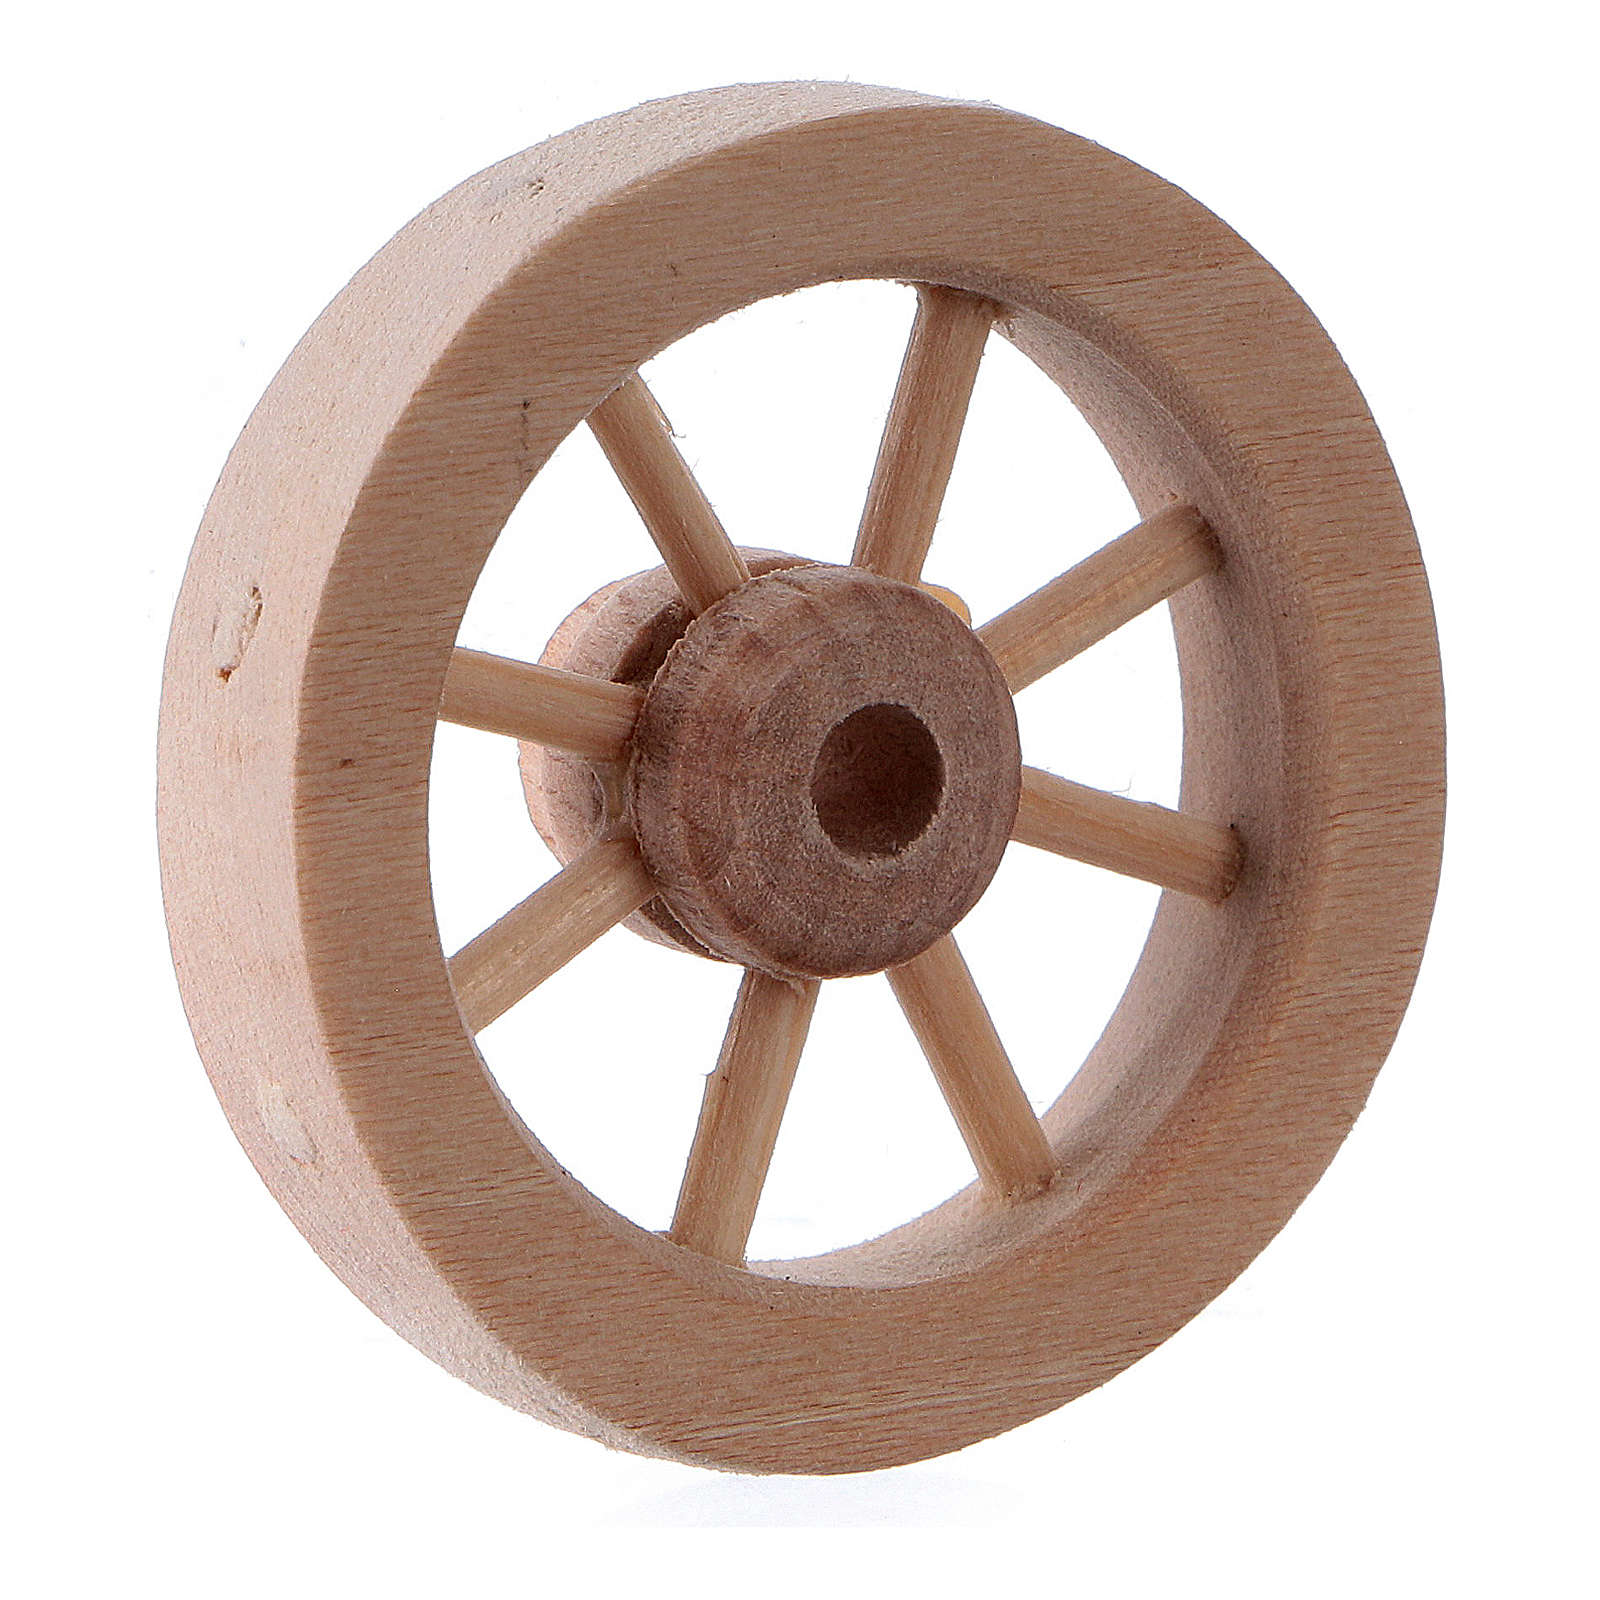 Ruota carro presepe legno chiaro diam. 3,5 cm 4